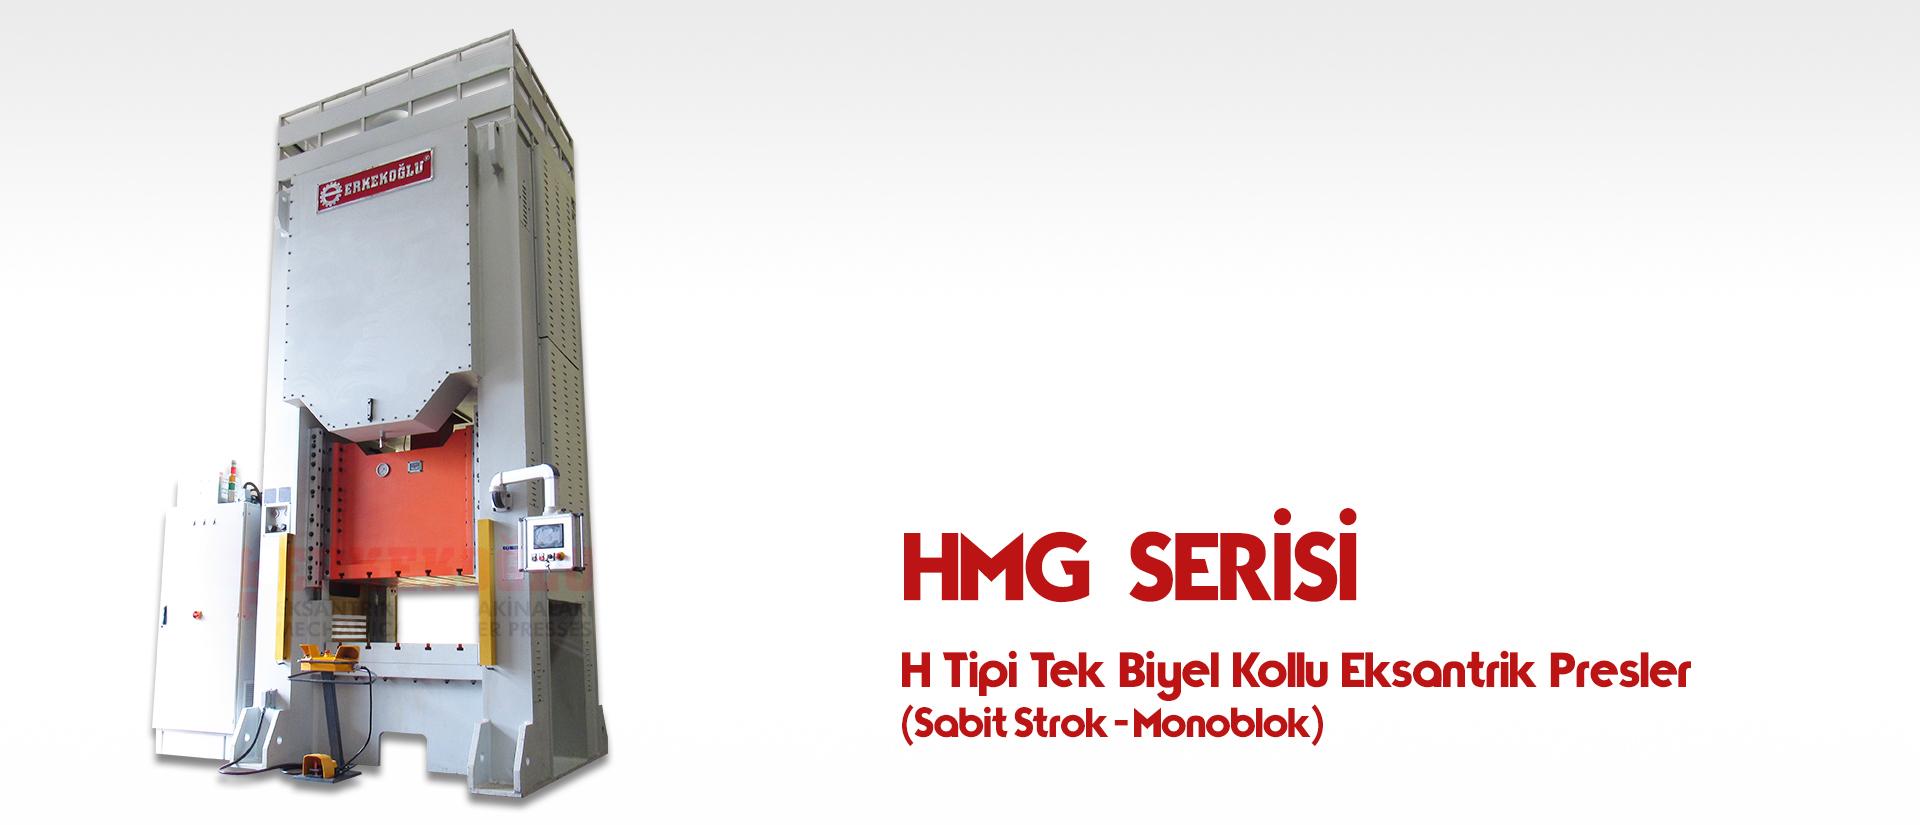 hmg-serisi